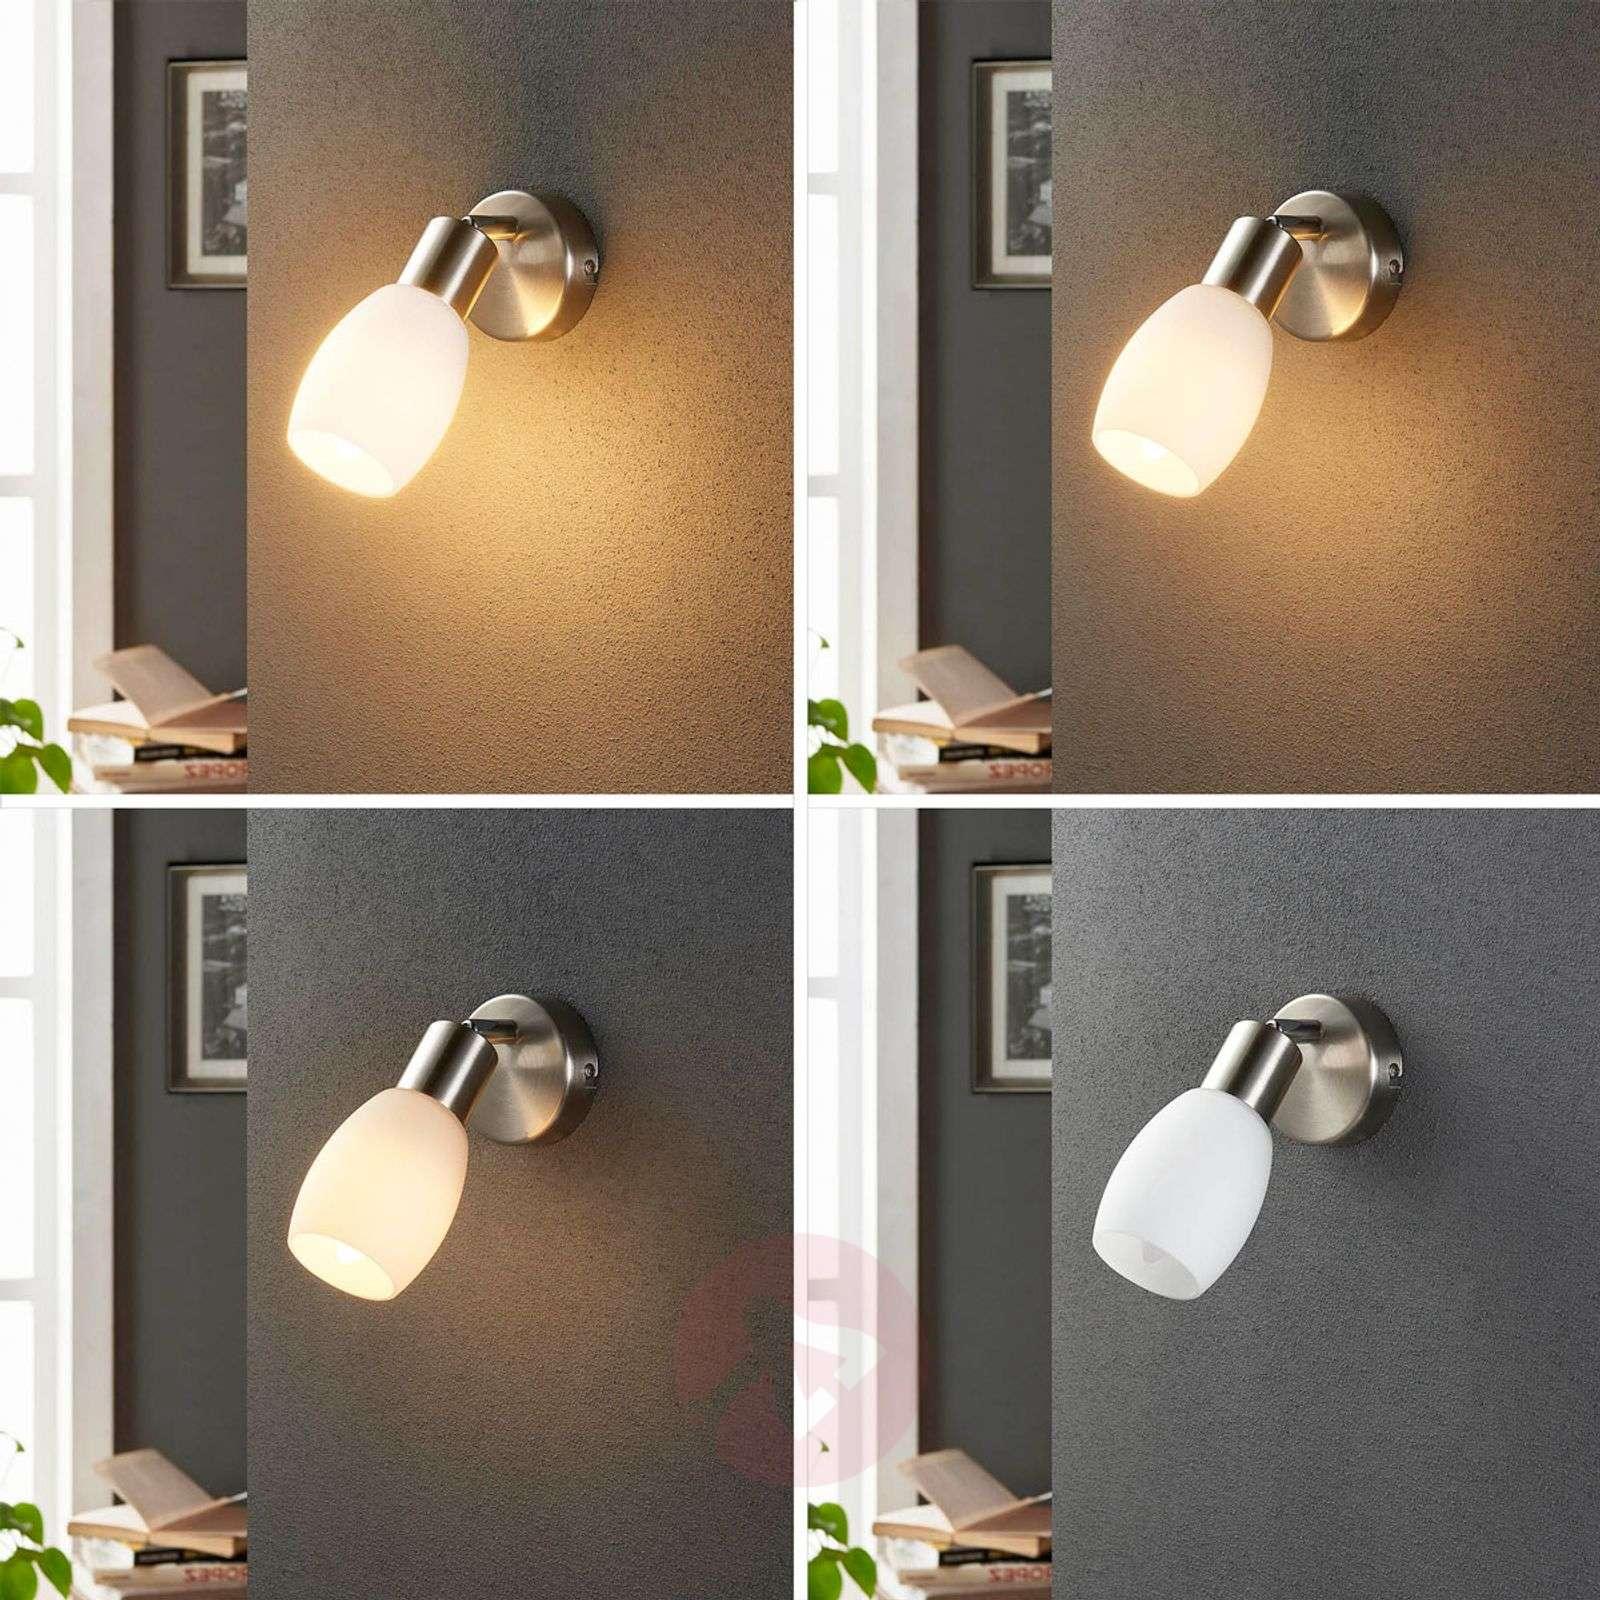 LED-spotti Arda Easydim-lampulla-9621262-02